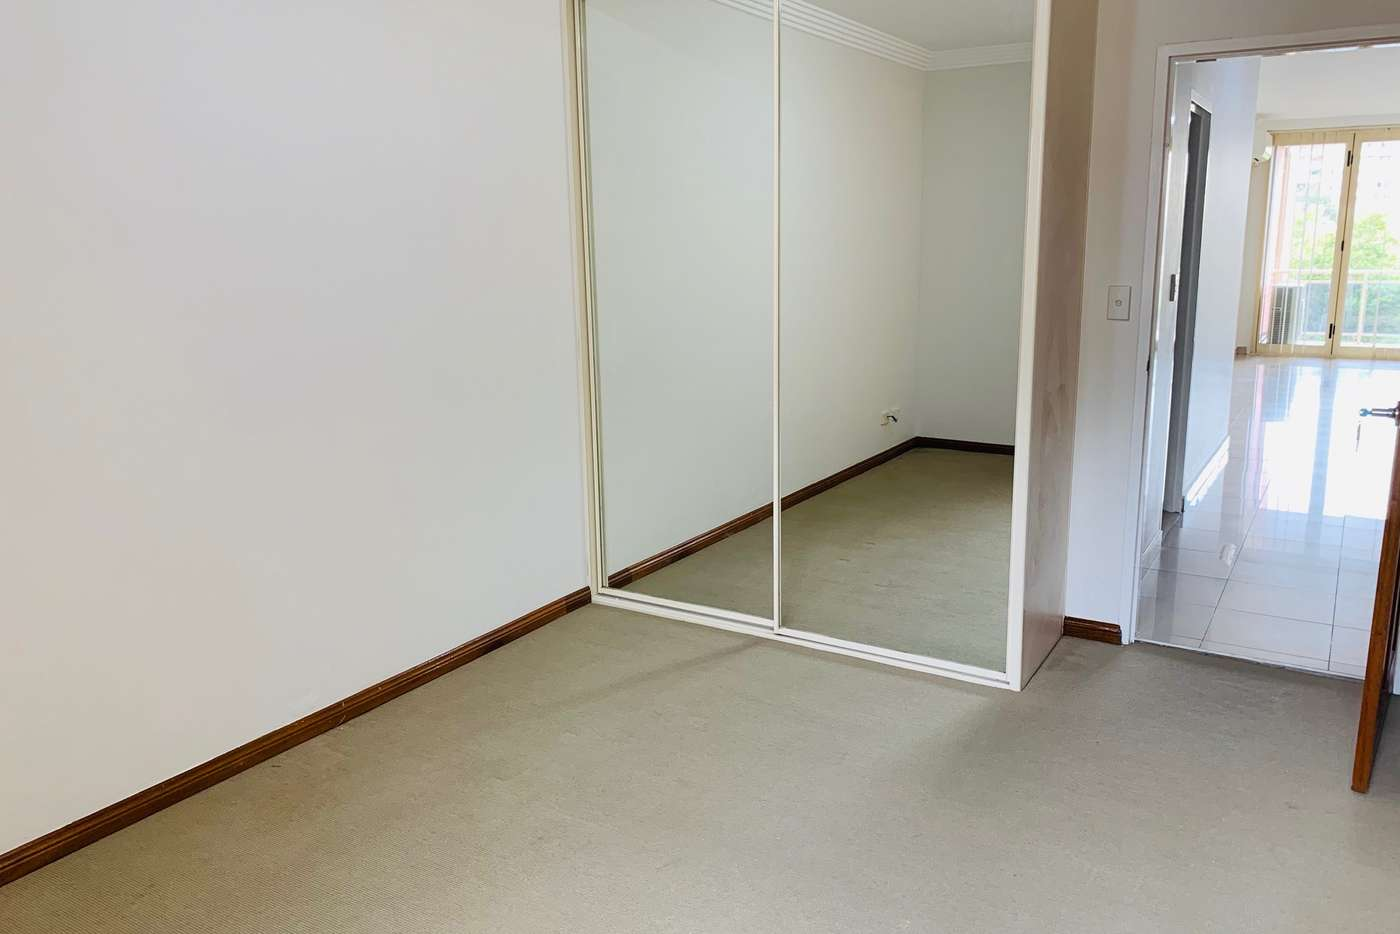 Sixth view of Homely unit listing, 12/125-131 Harrow Road, Kogarah NSW 2217